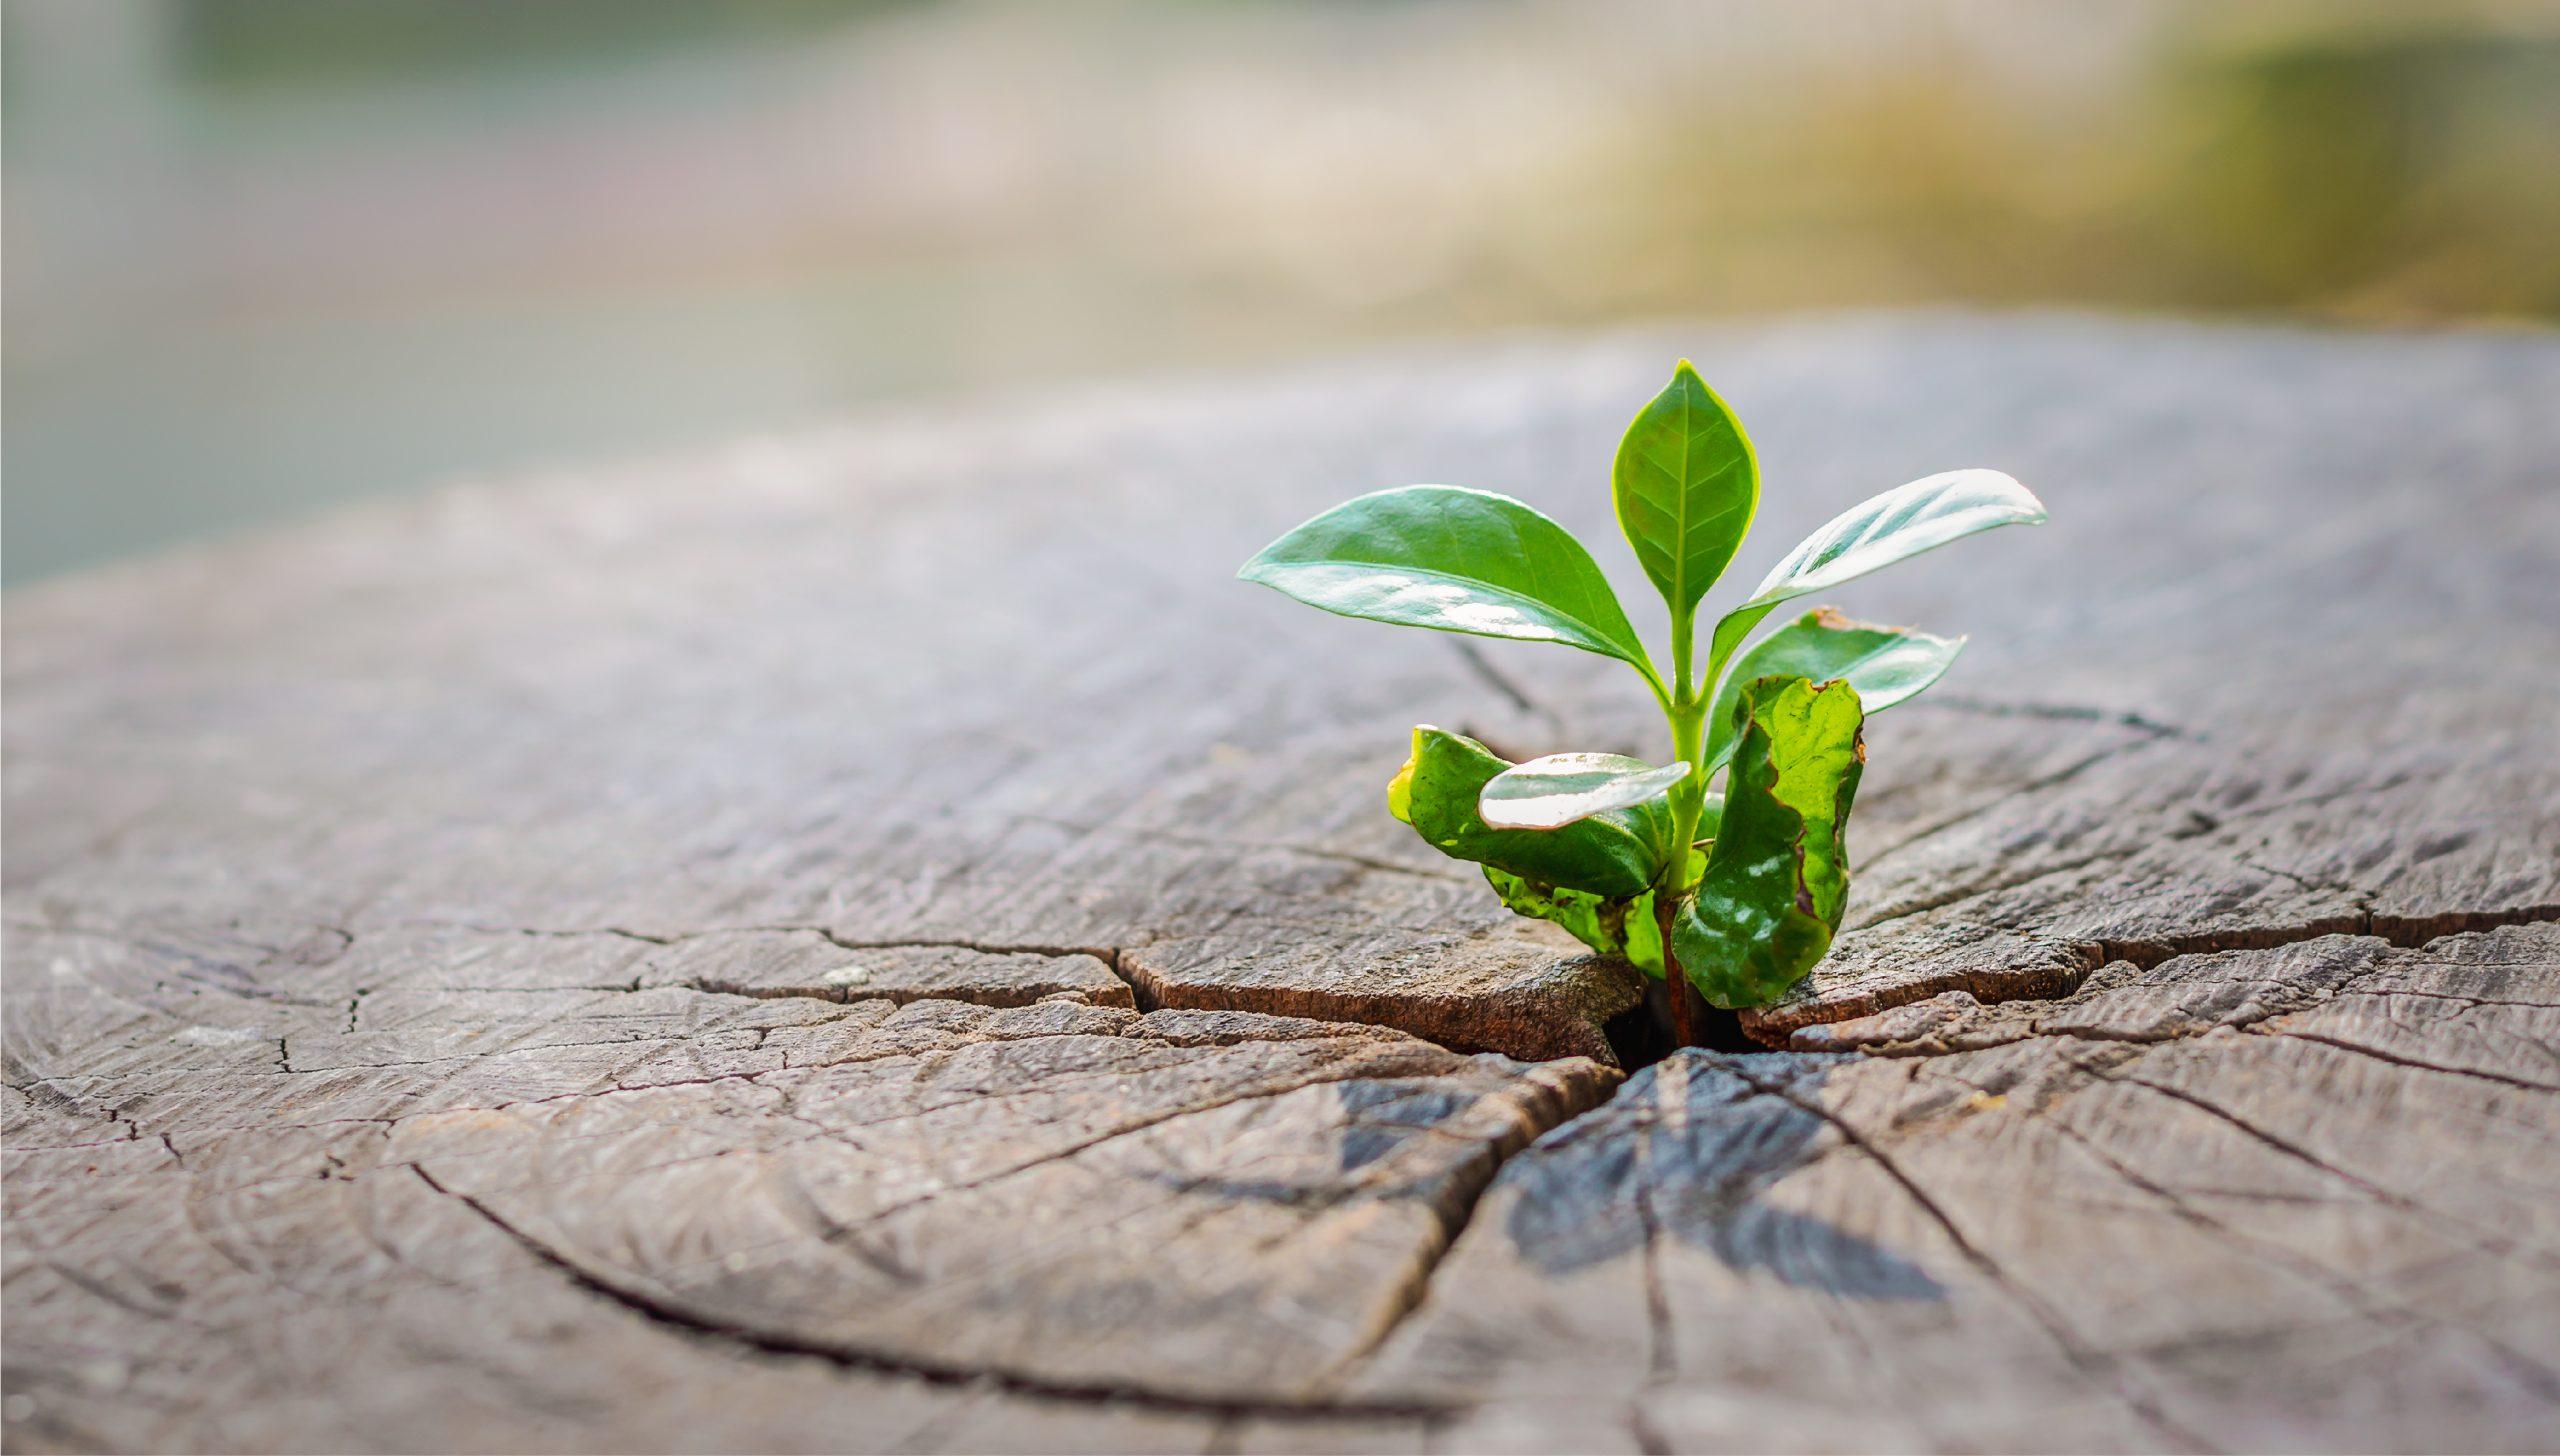 Plant growing in unusual surrounding